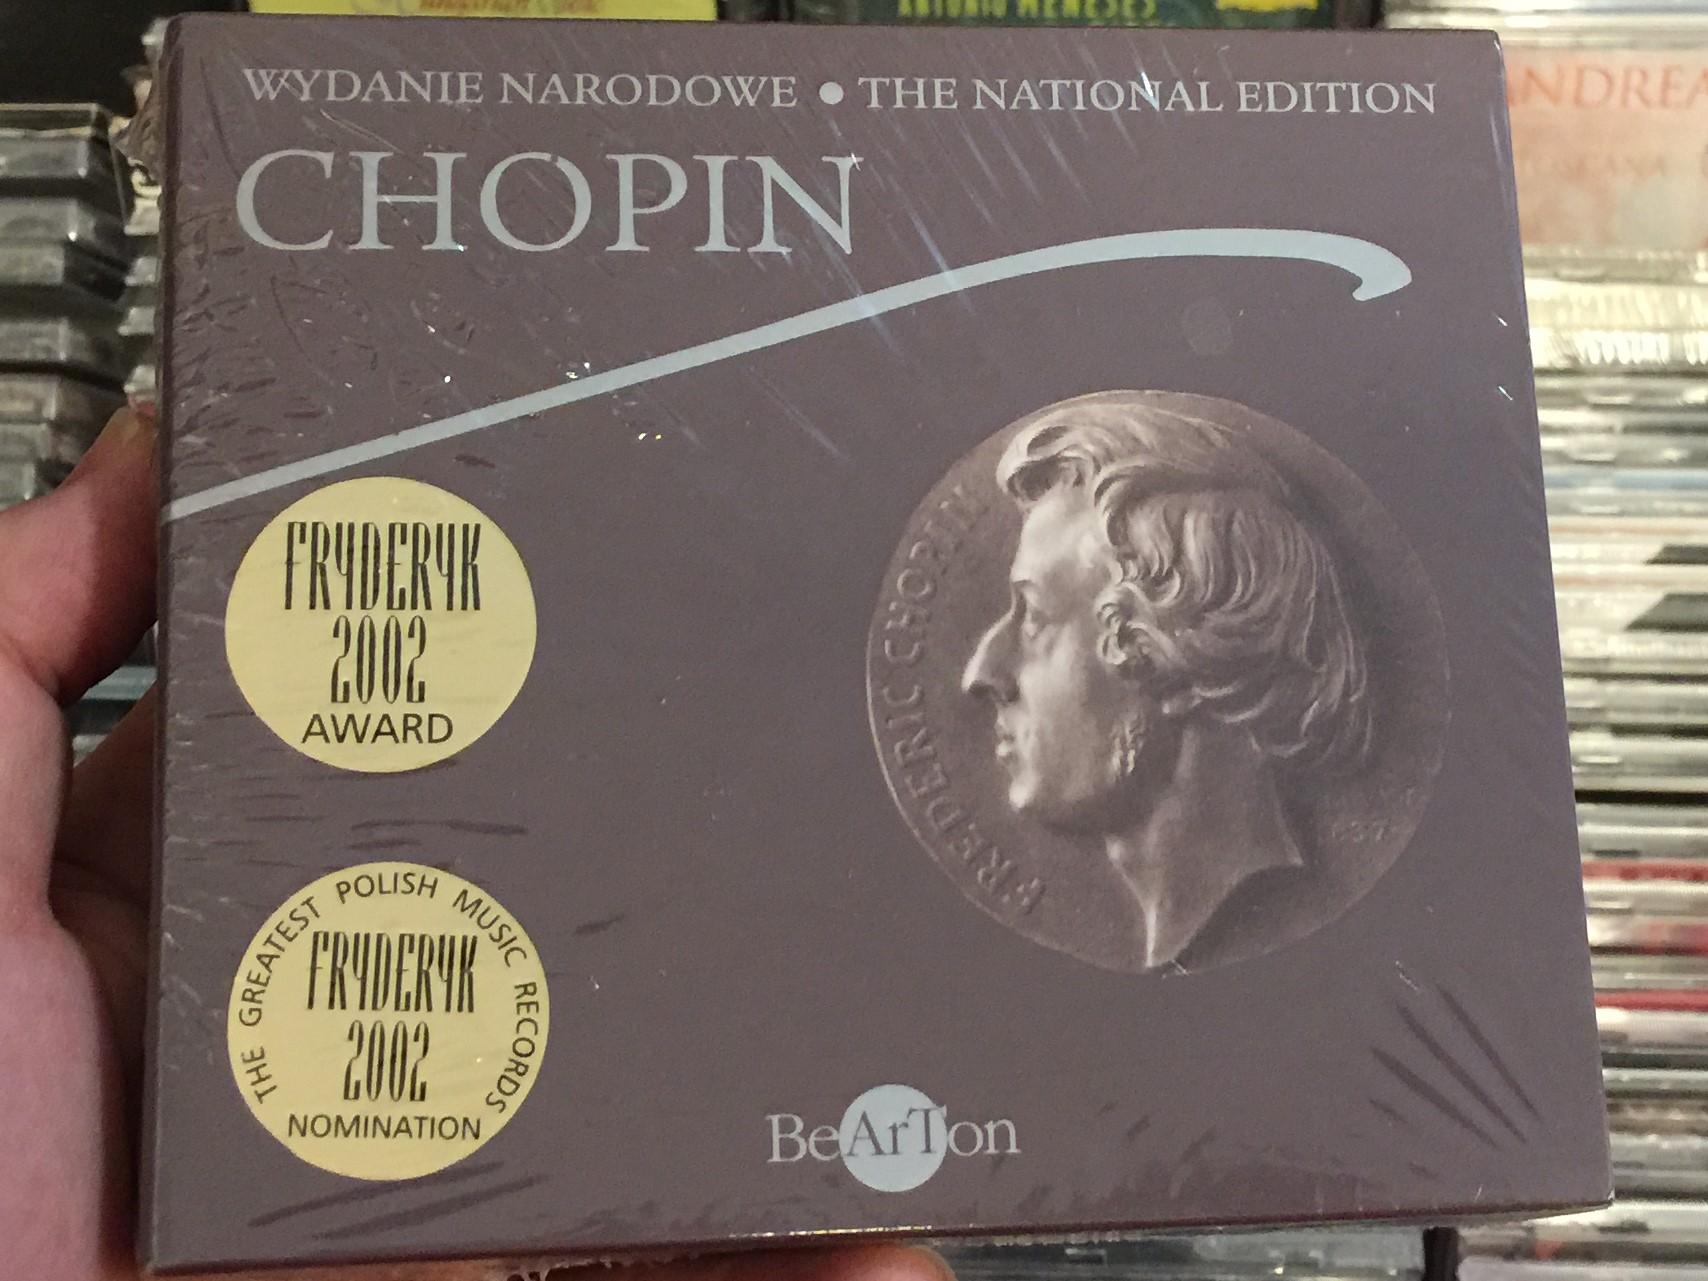 wydanie-narodowe-the-national-edition-chopin-fryderyk-2002-award-fryderyk-2002-nomination-bearton-5x-audio-cd-5908311807217-1-.jpg